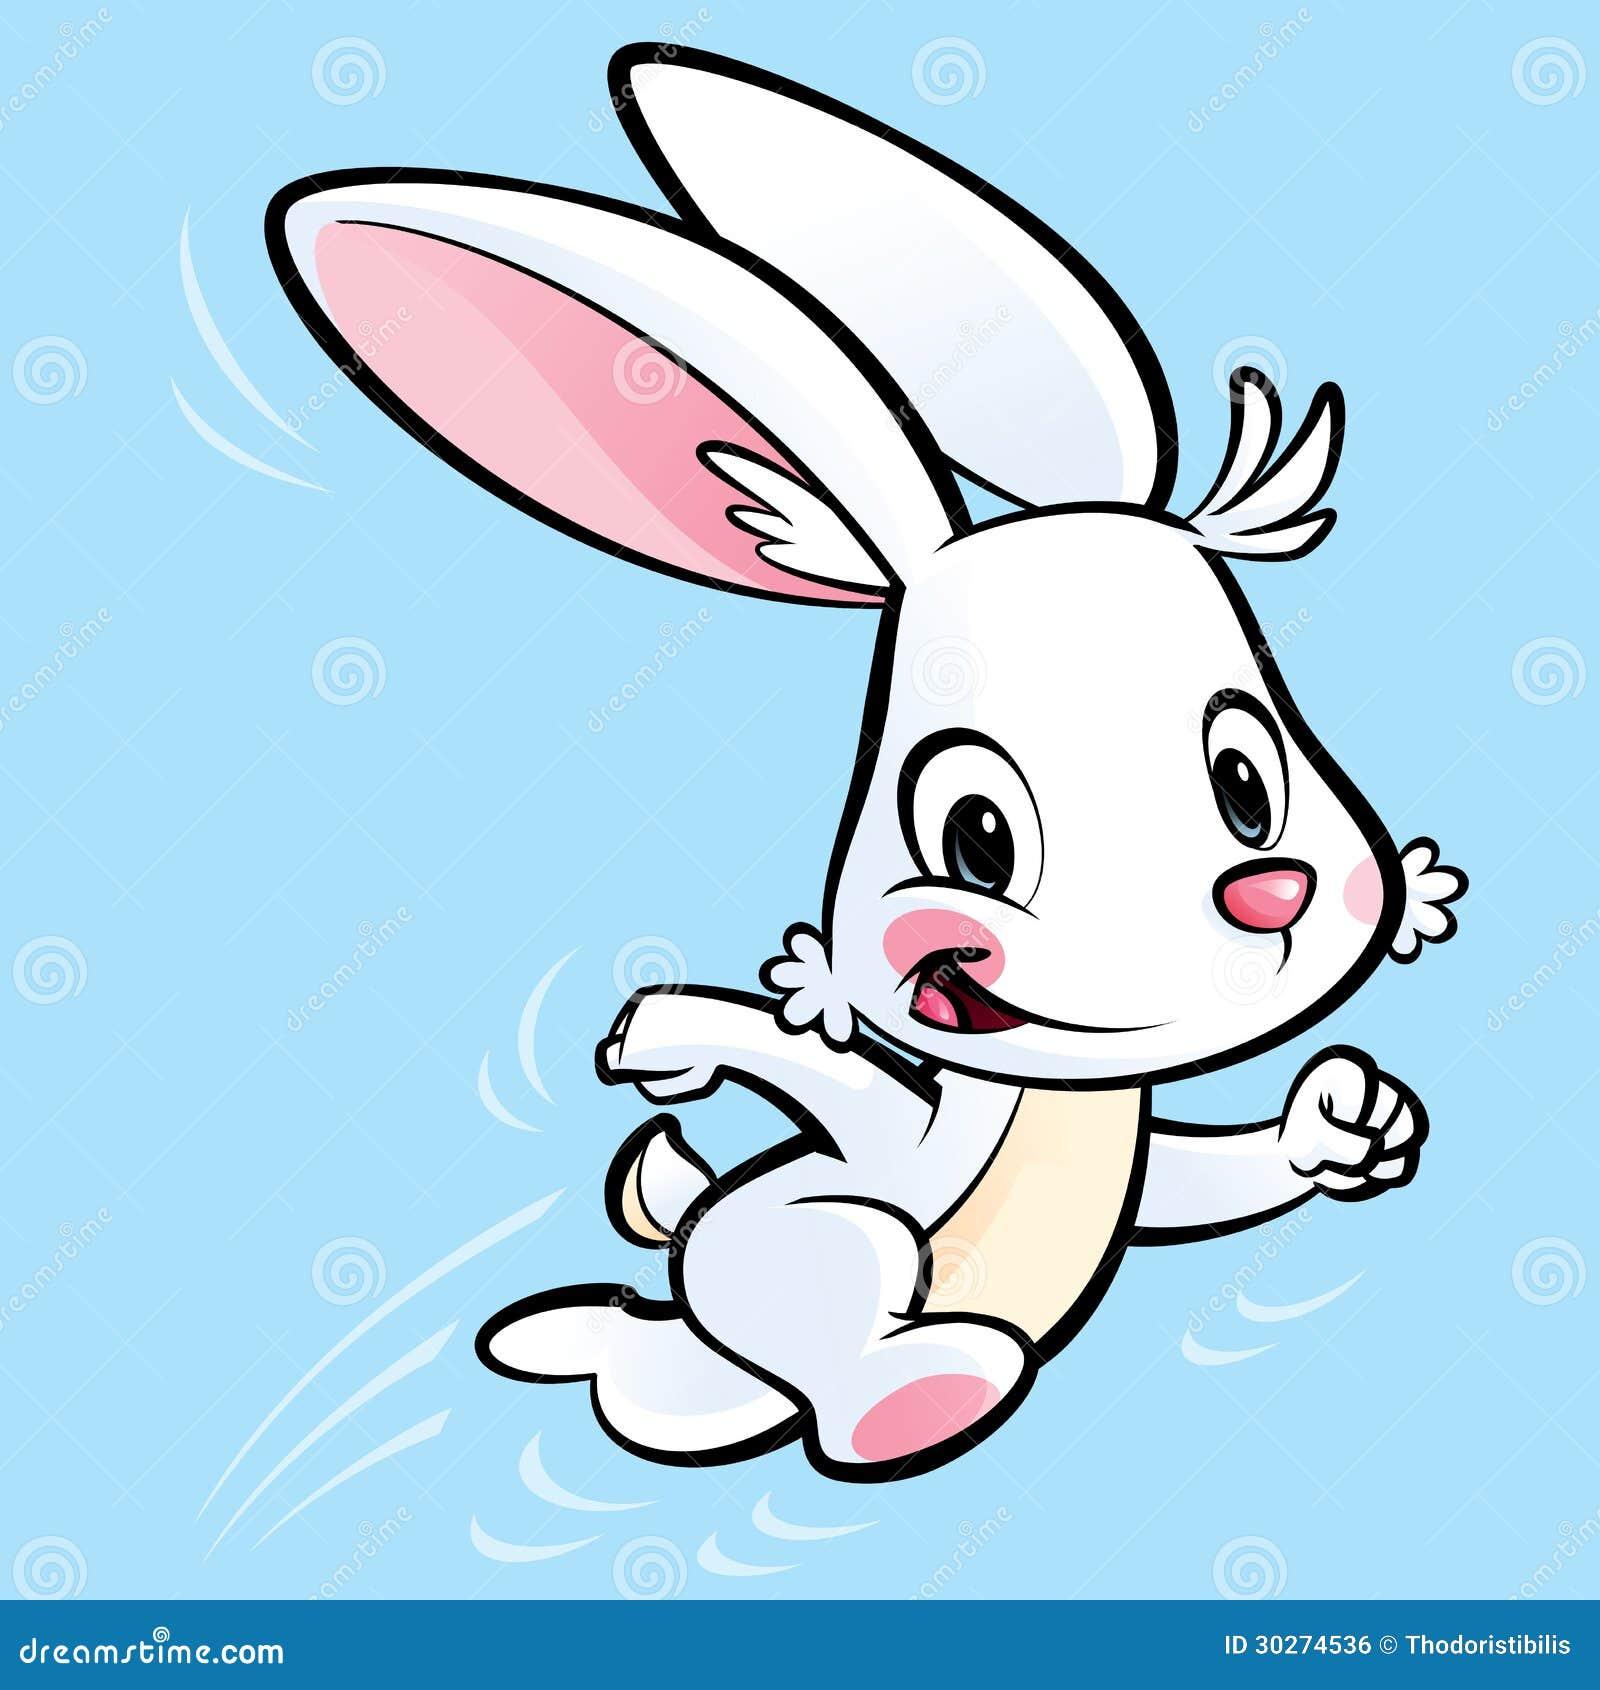 cute rabbit cartoon images